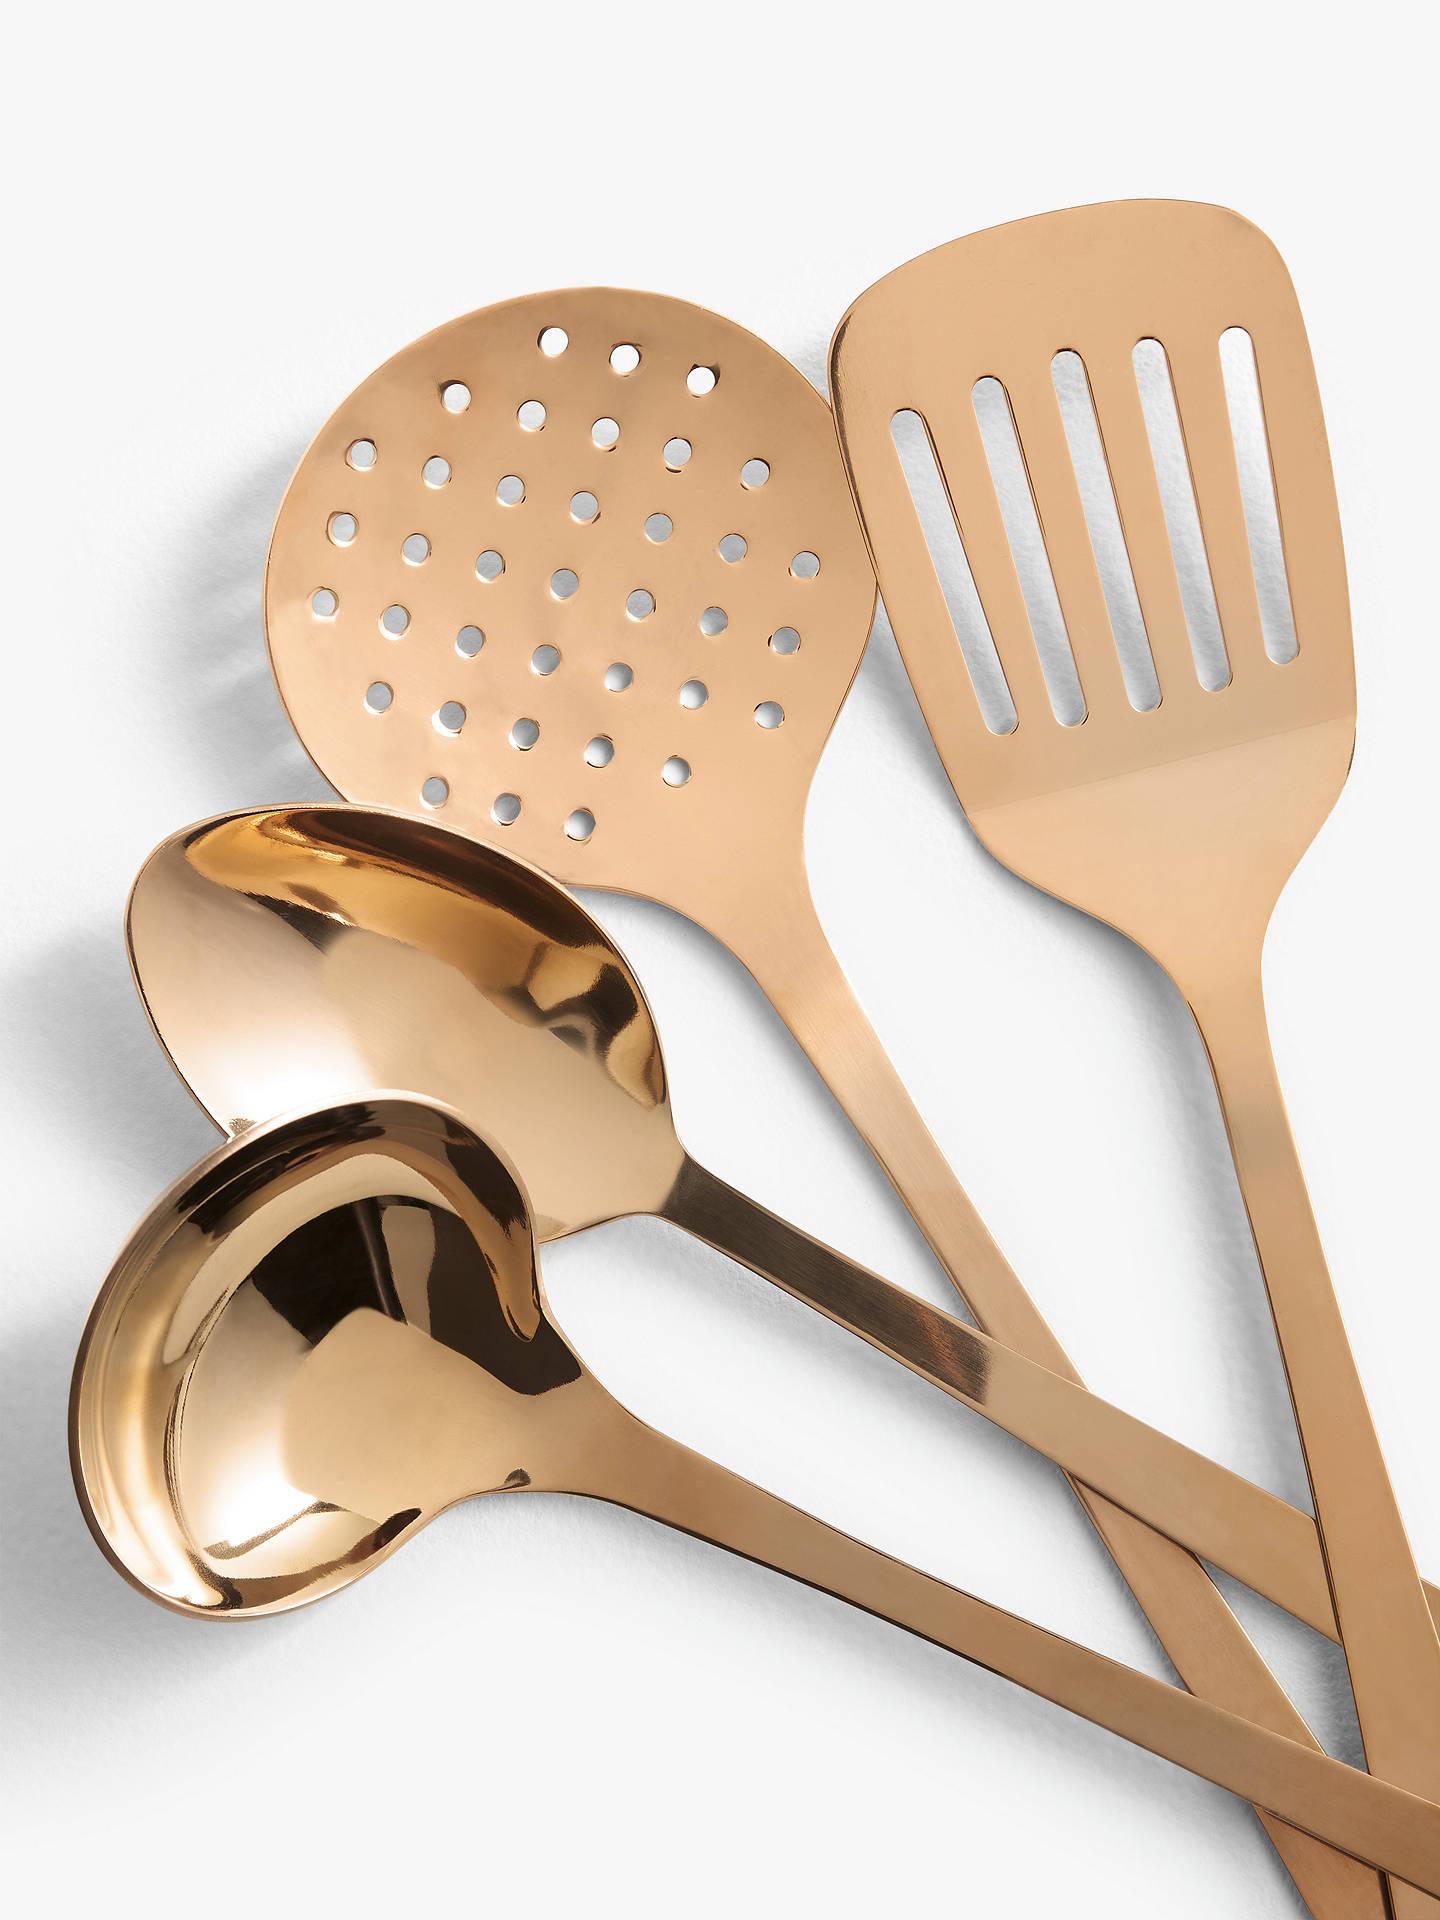 John Lewis & Partners Stainless Steel Kitchen Utensils, Set of 11, Rose Gold